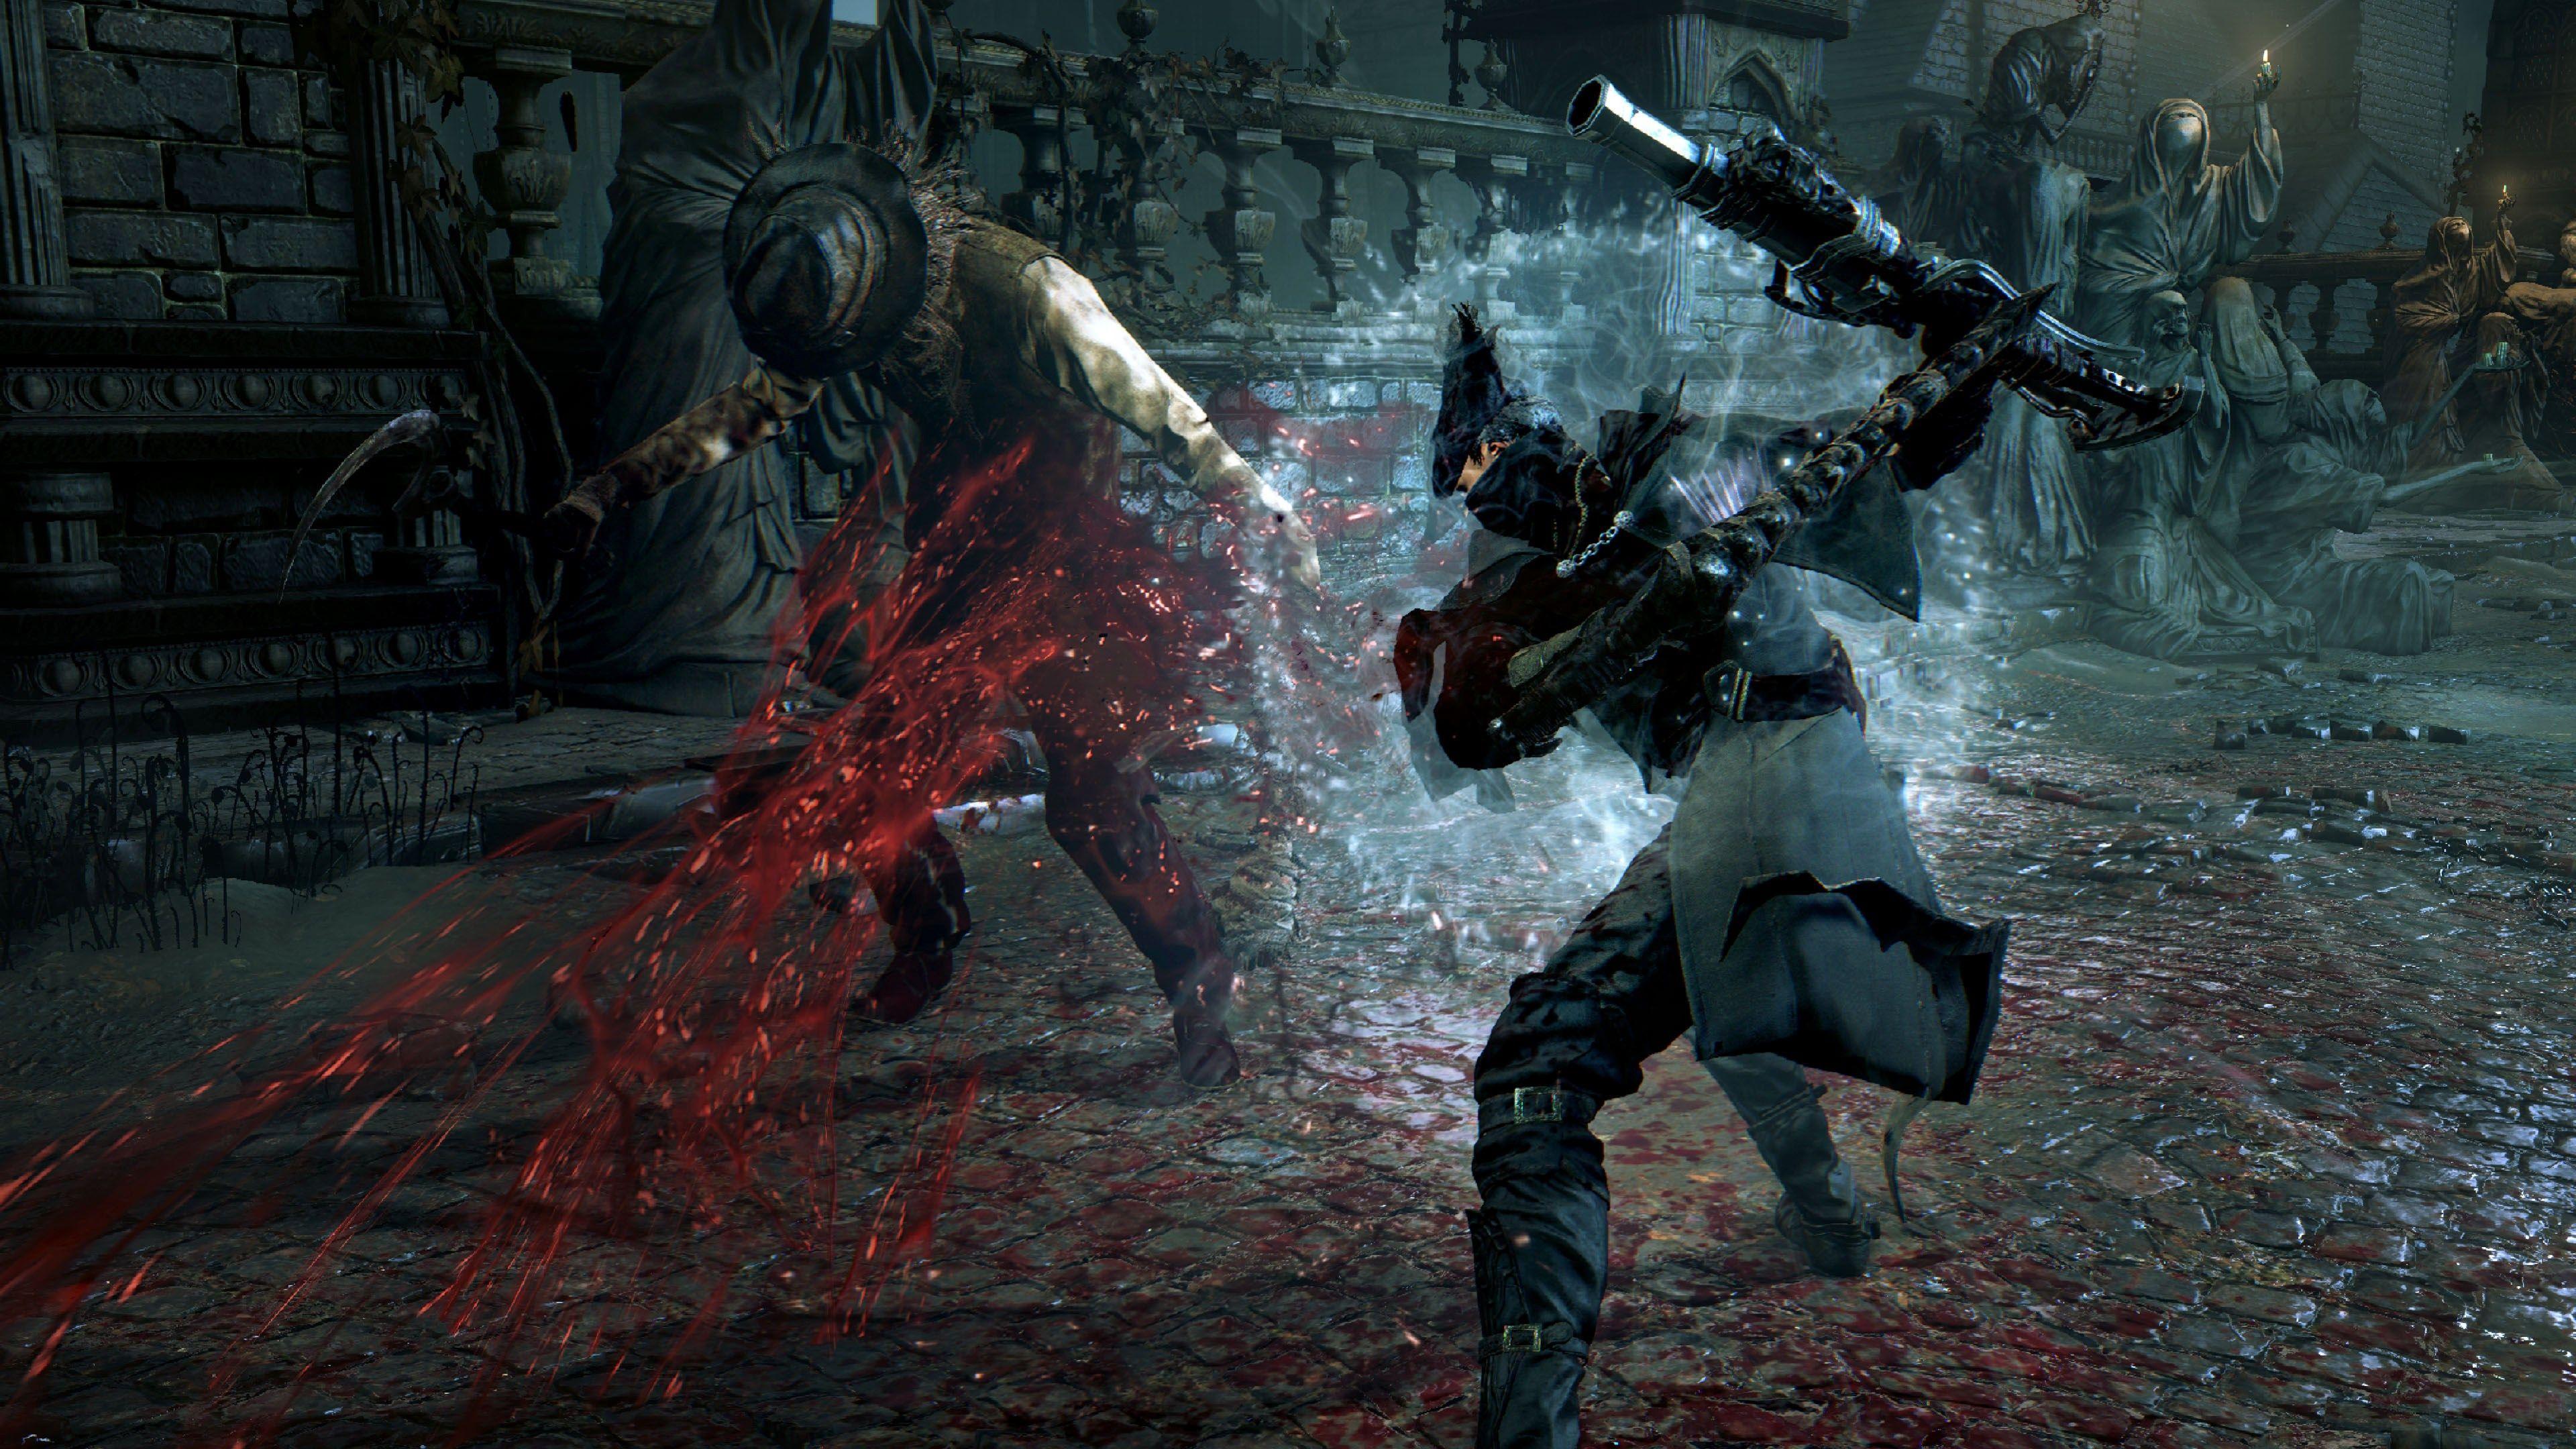 Image For Desktop Bloodborne Bloodborne Ps4 Exclusives Bloodborne Ps4